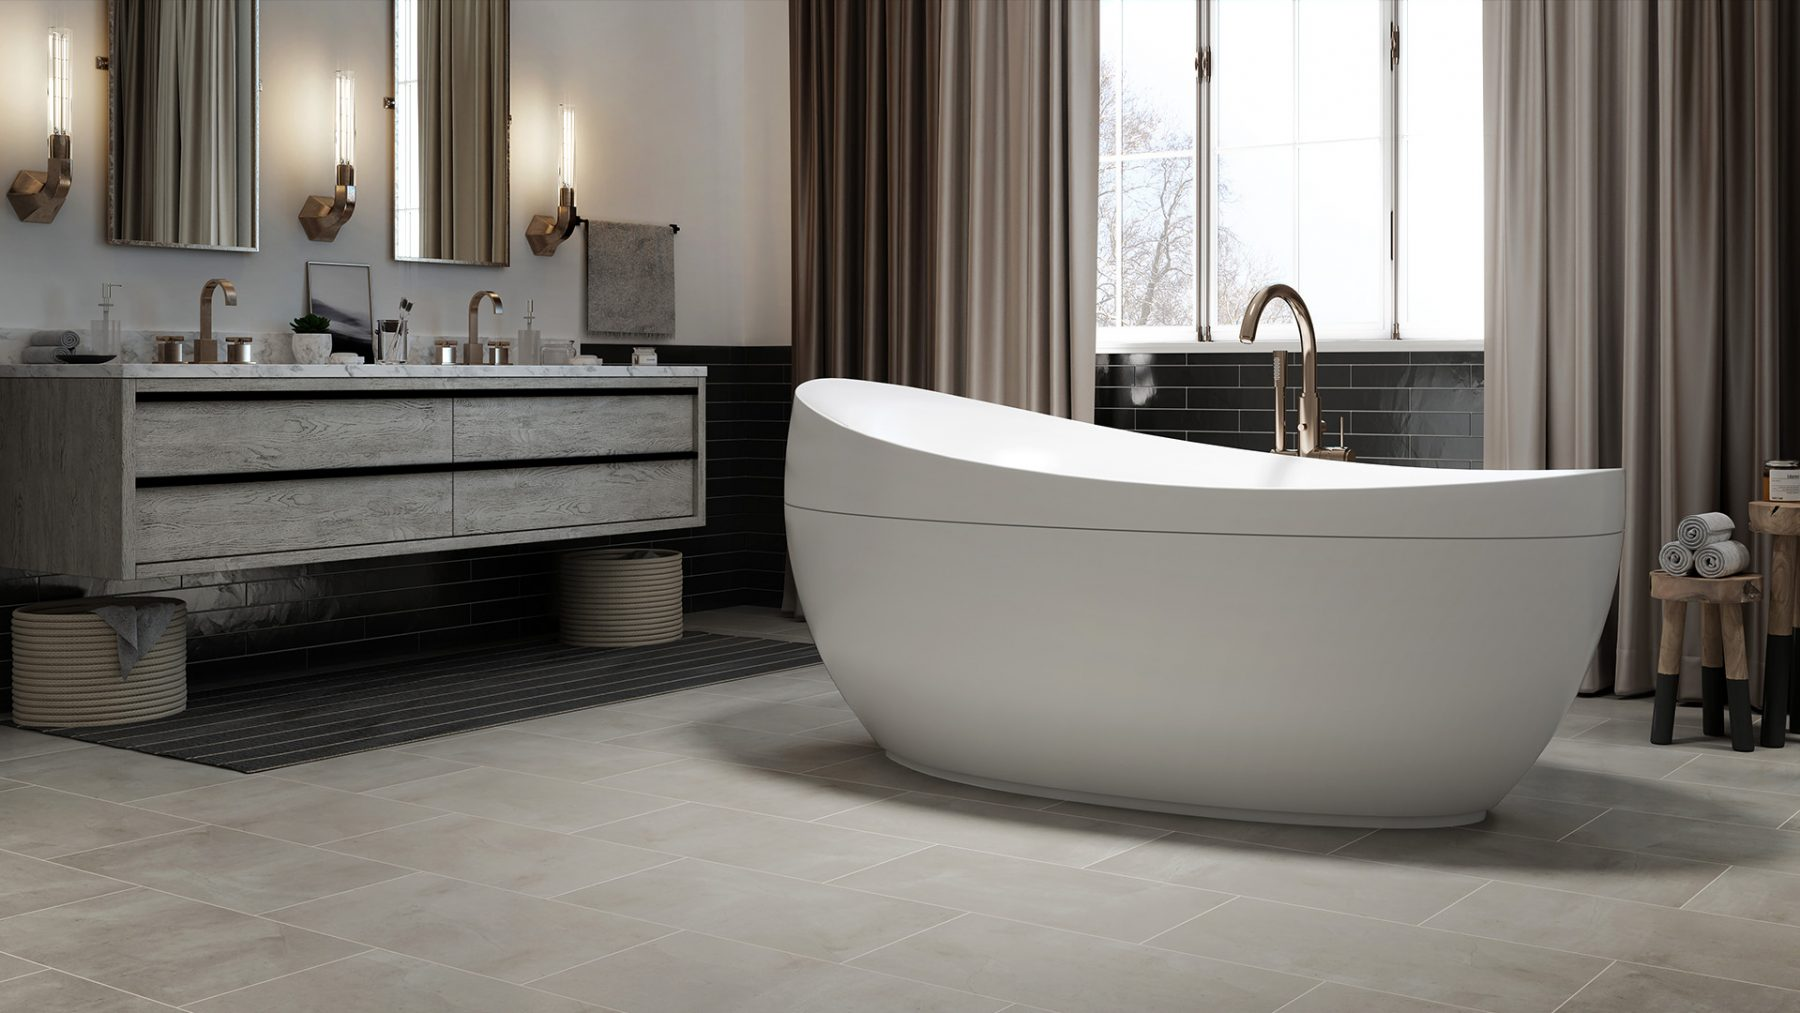 photorealist-rustic-bathroom-bathtub-black-design